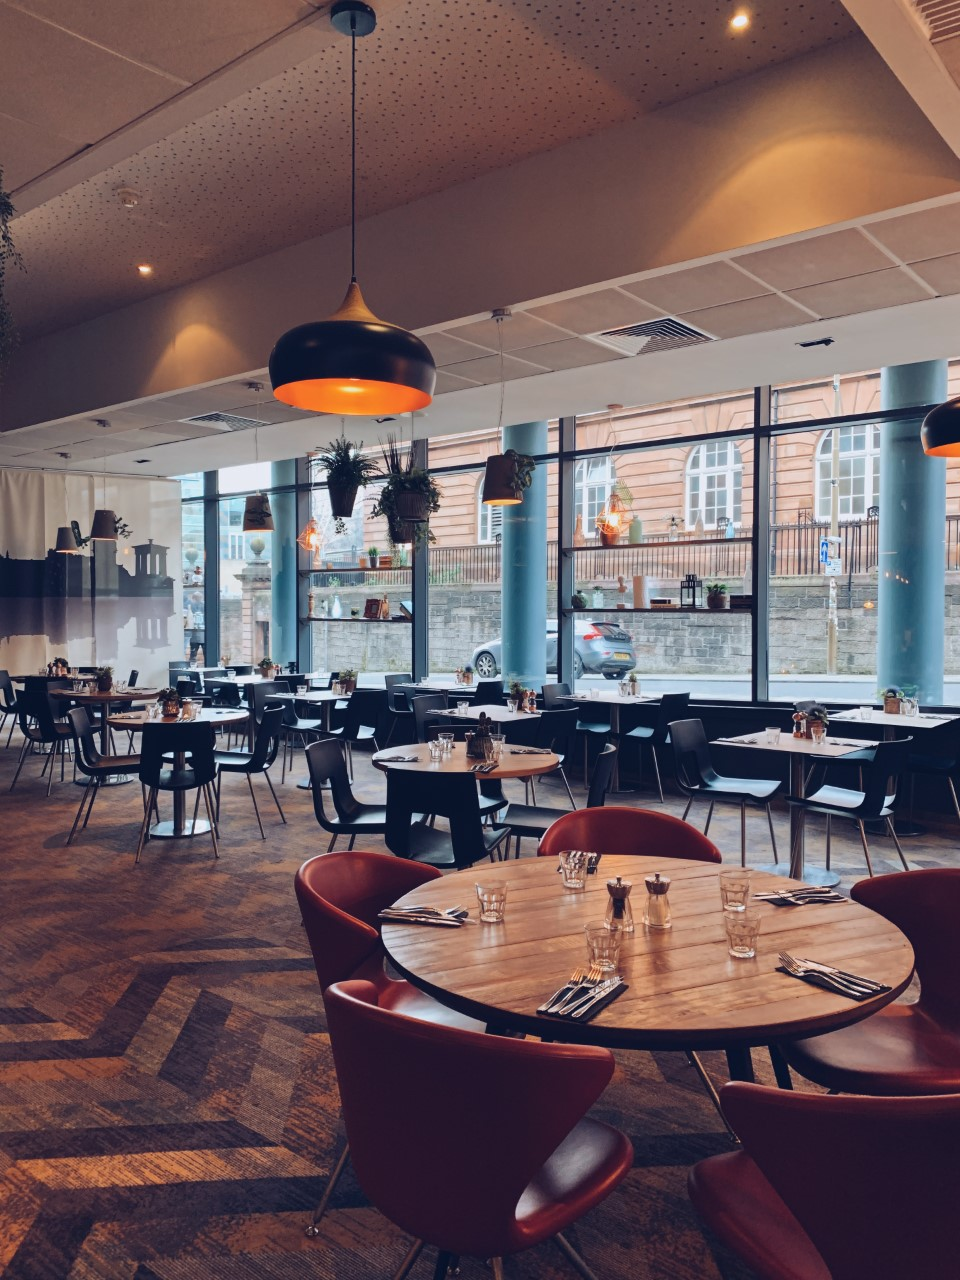 Novotel Edinburgh restaurant